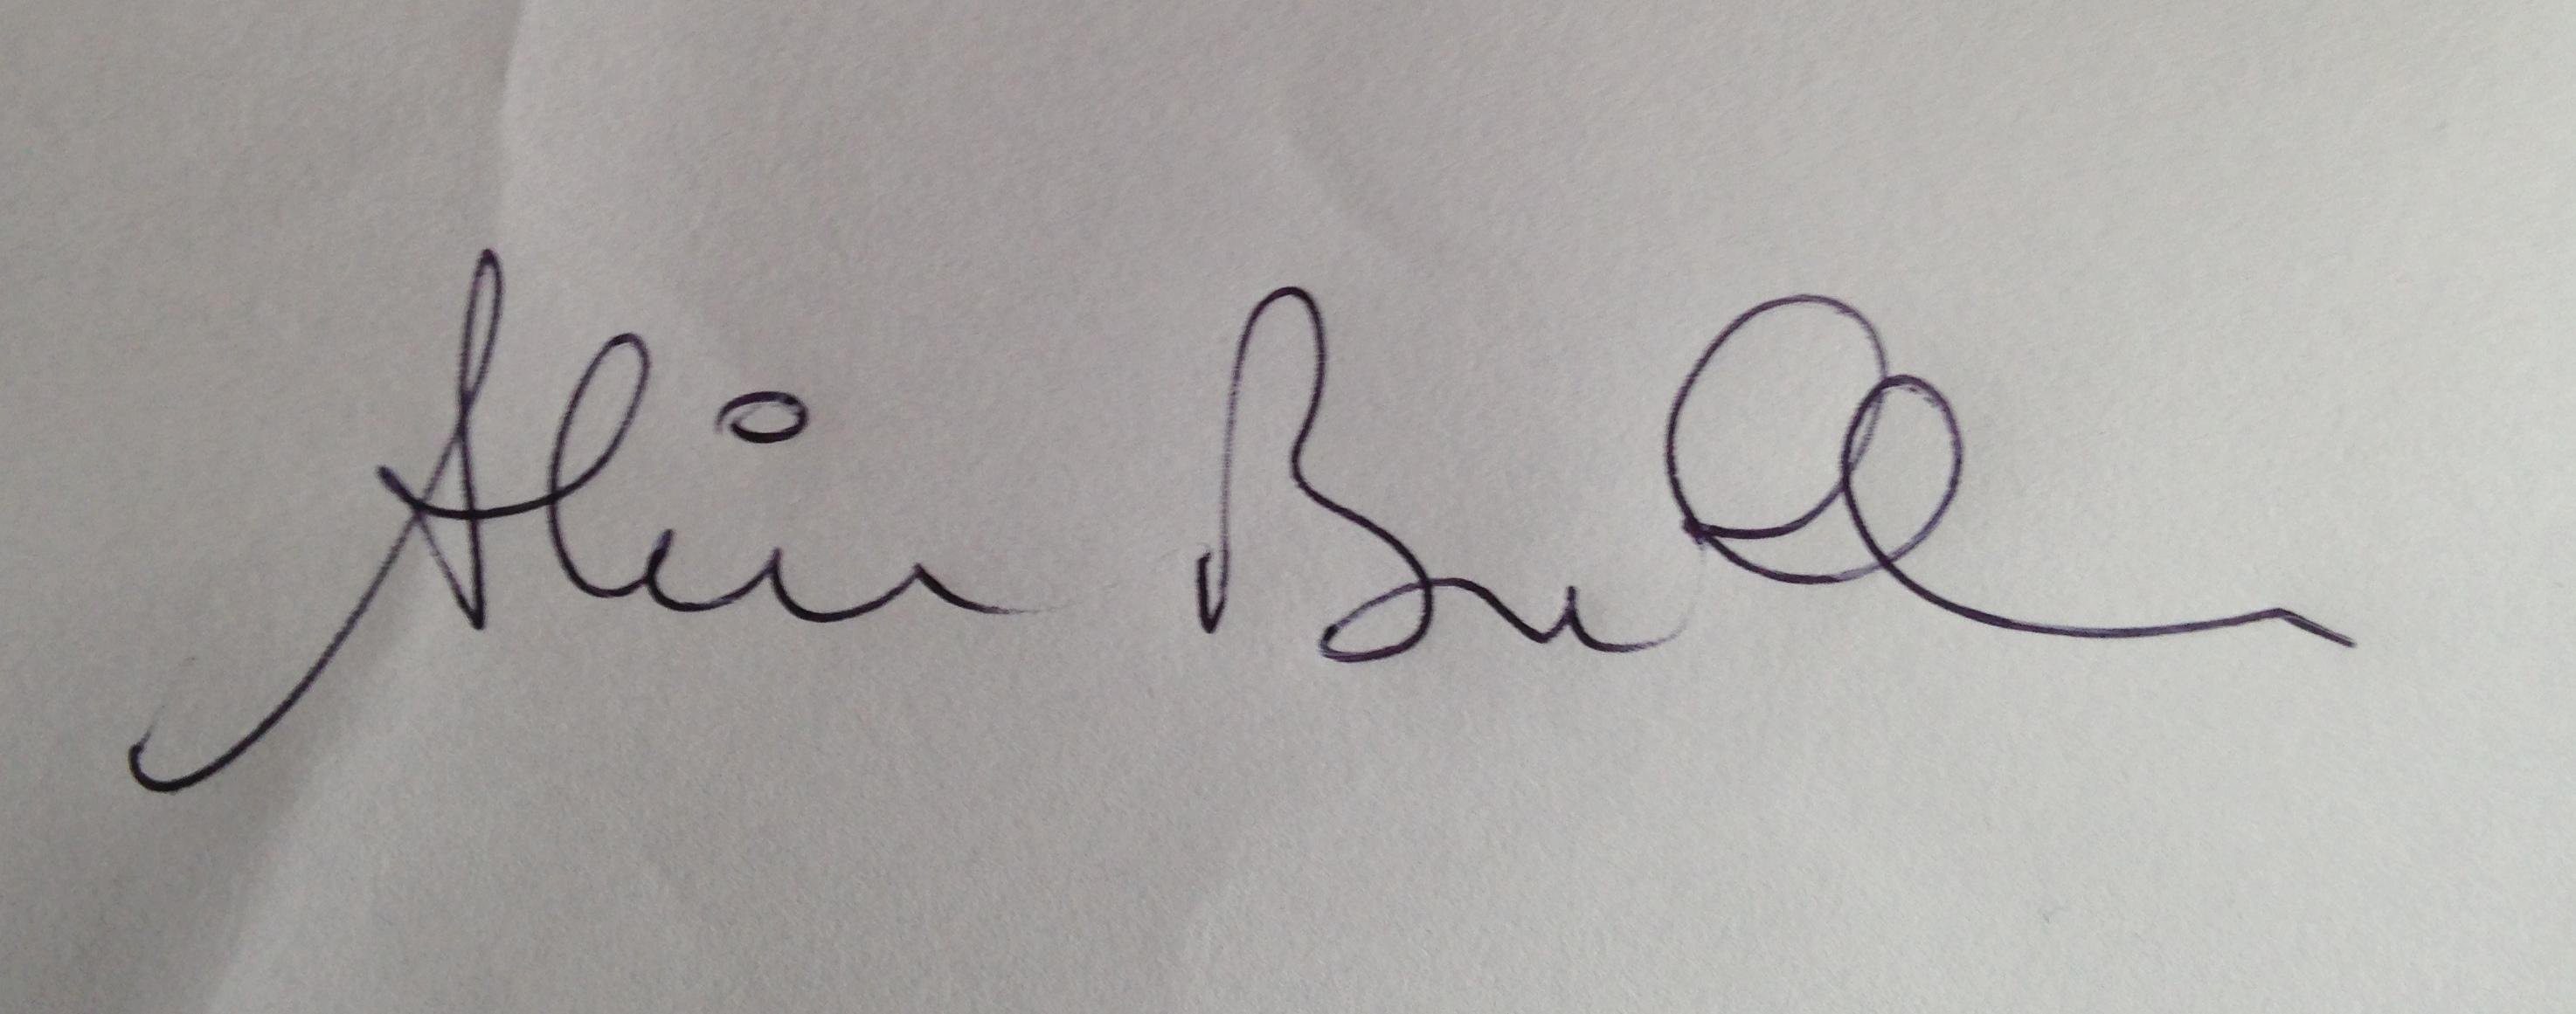 ALAIN BULLE's Signature